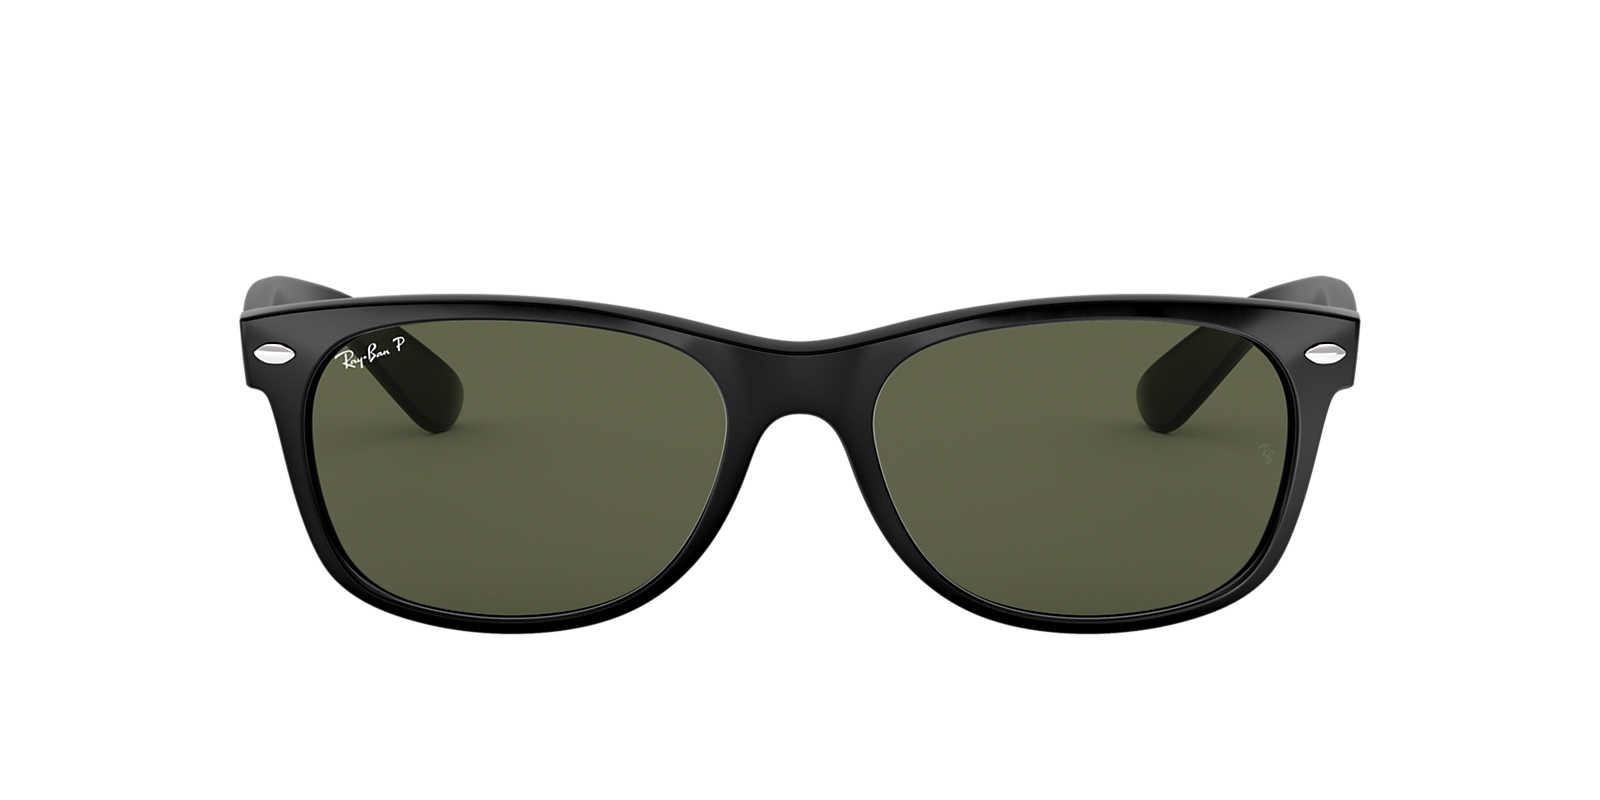 Ray ban sunglasses sale new zealand - Ray Ban Black Rb2132 Green Polarised Lenses 55mm